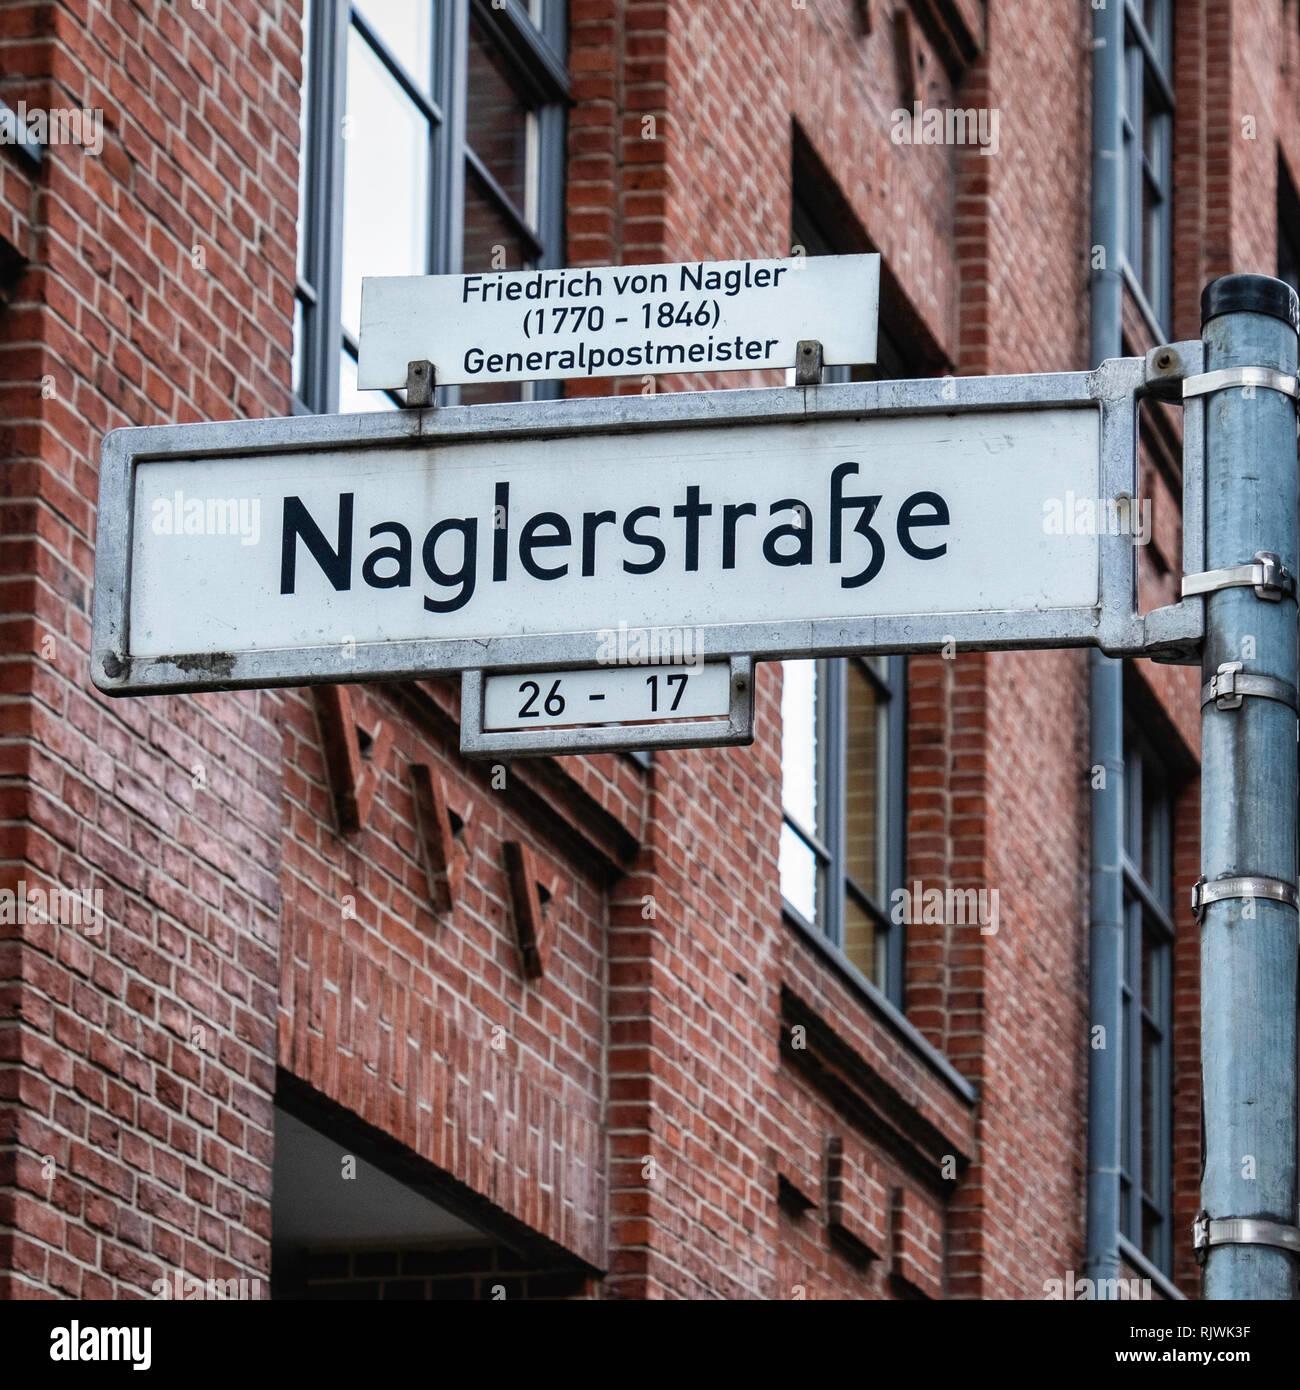 Berlin,Friedrichshain, Naglerstrasse street sign in road named after Friedrich von Nagler, General Postmaster - Stock Image